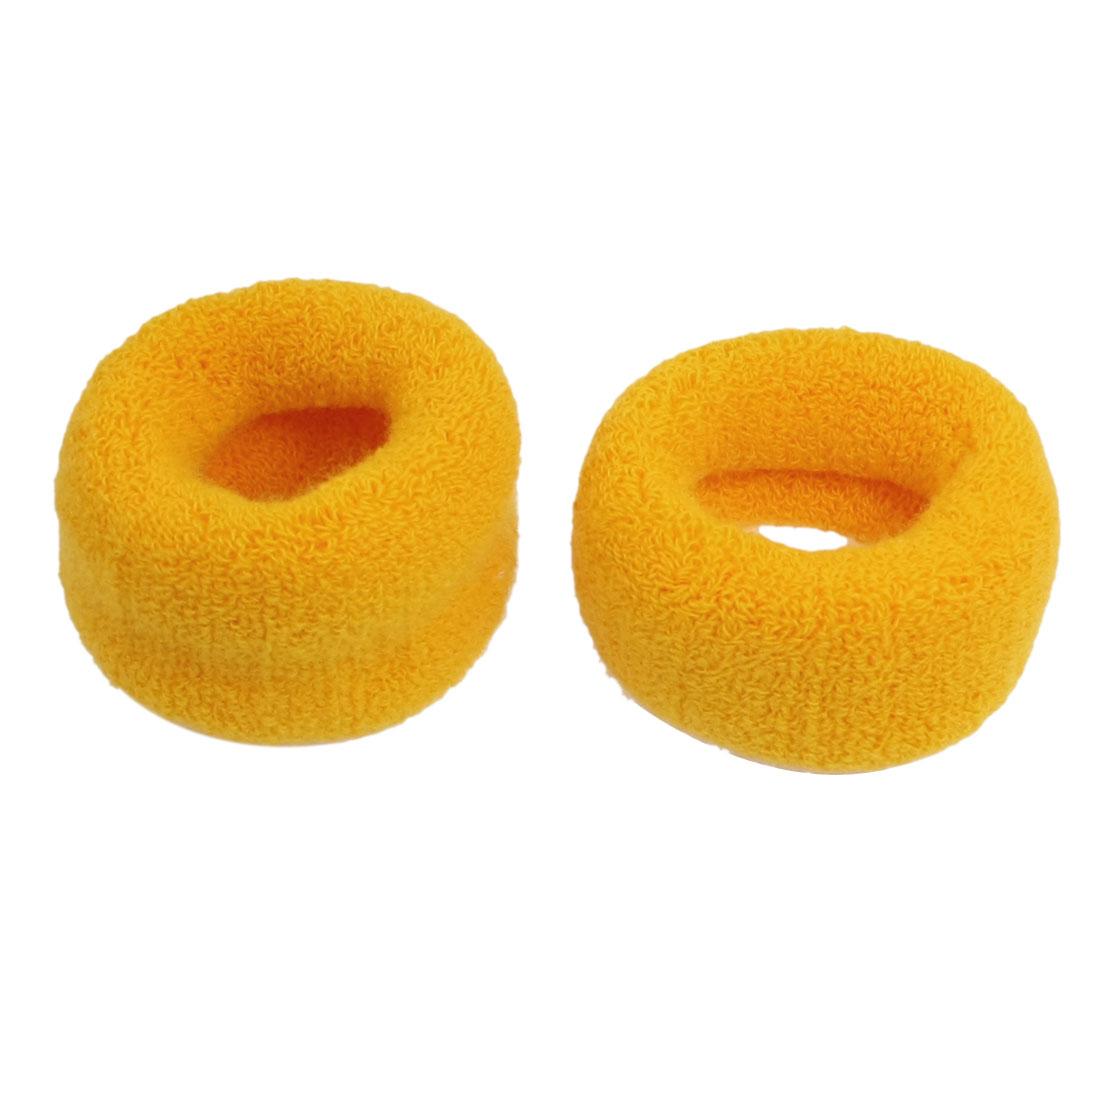 2 Pcs Terry Cloth Stretch Hairband Hair Tie Wrap Ponytail Holder Orange